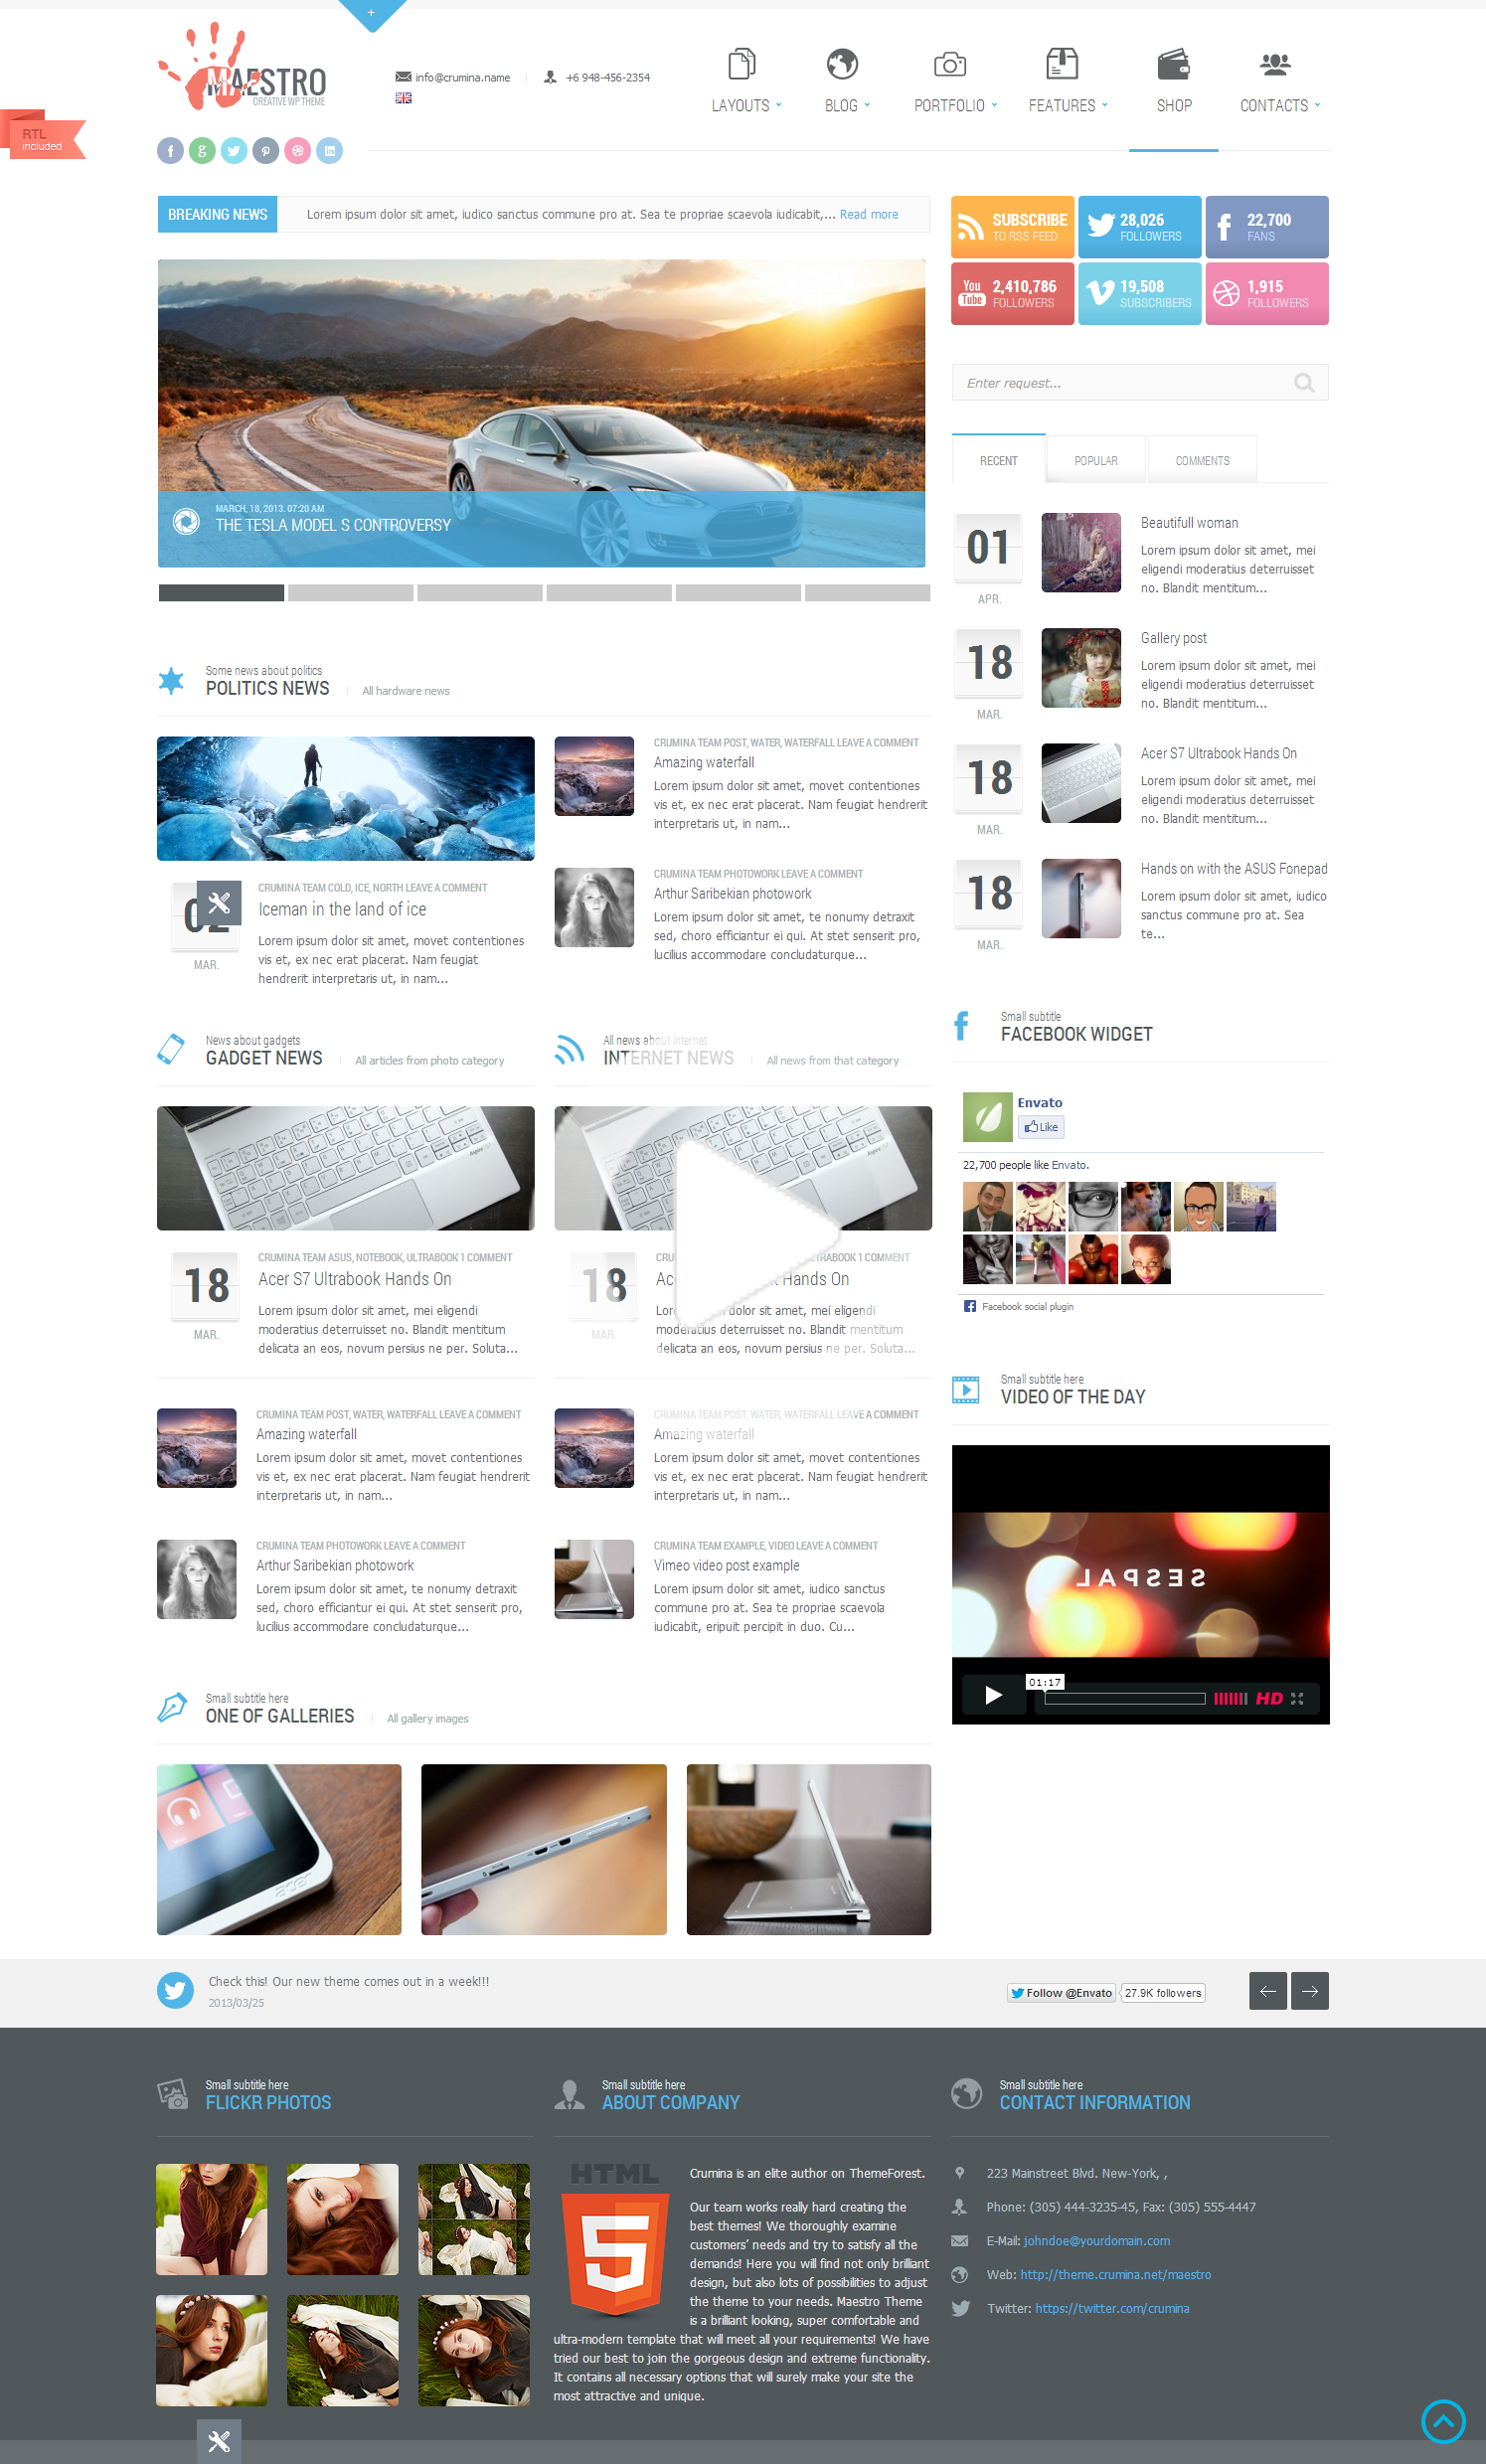 15 Best Web Design Trends In 2021 Modern Website Examples Web Design Trends Latest Web Design Trends Web Design Quotes